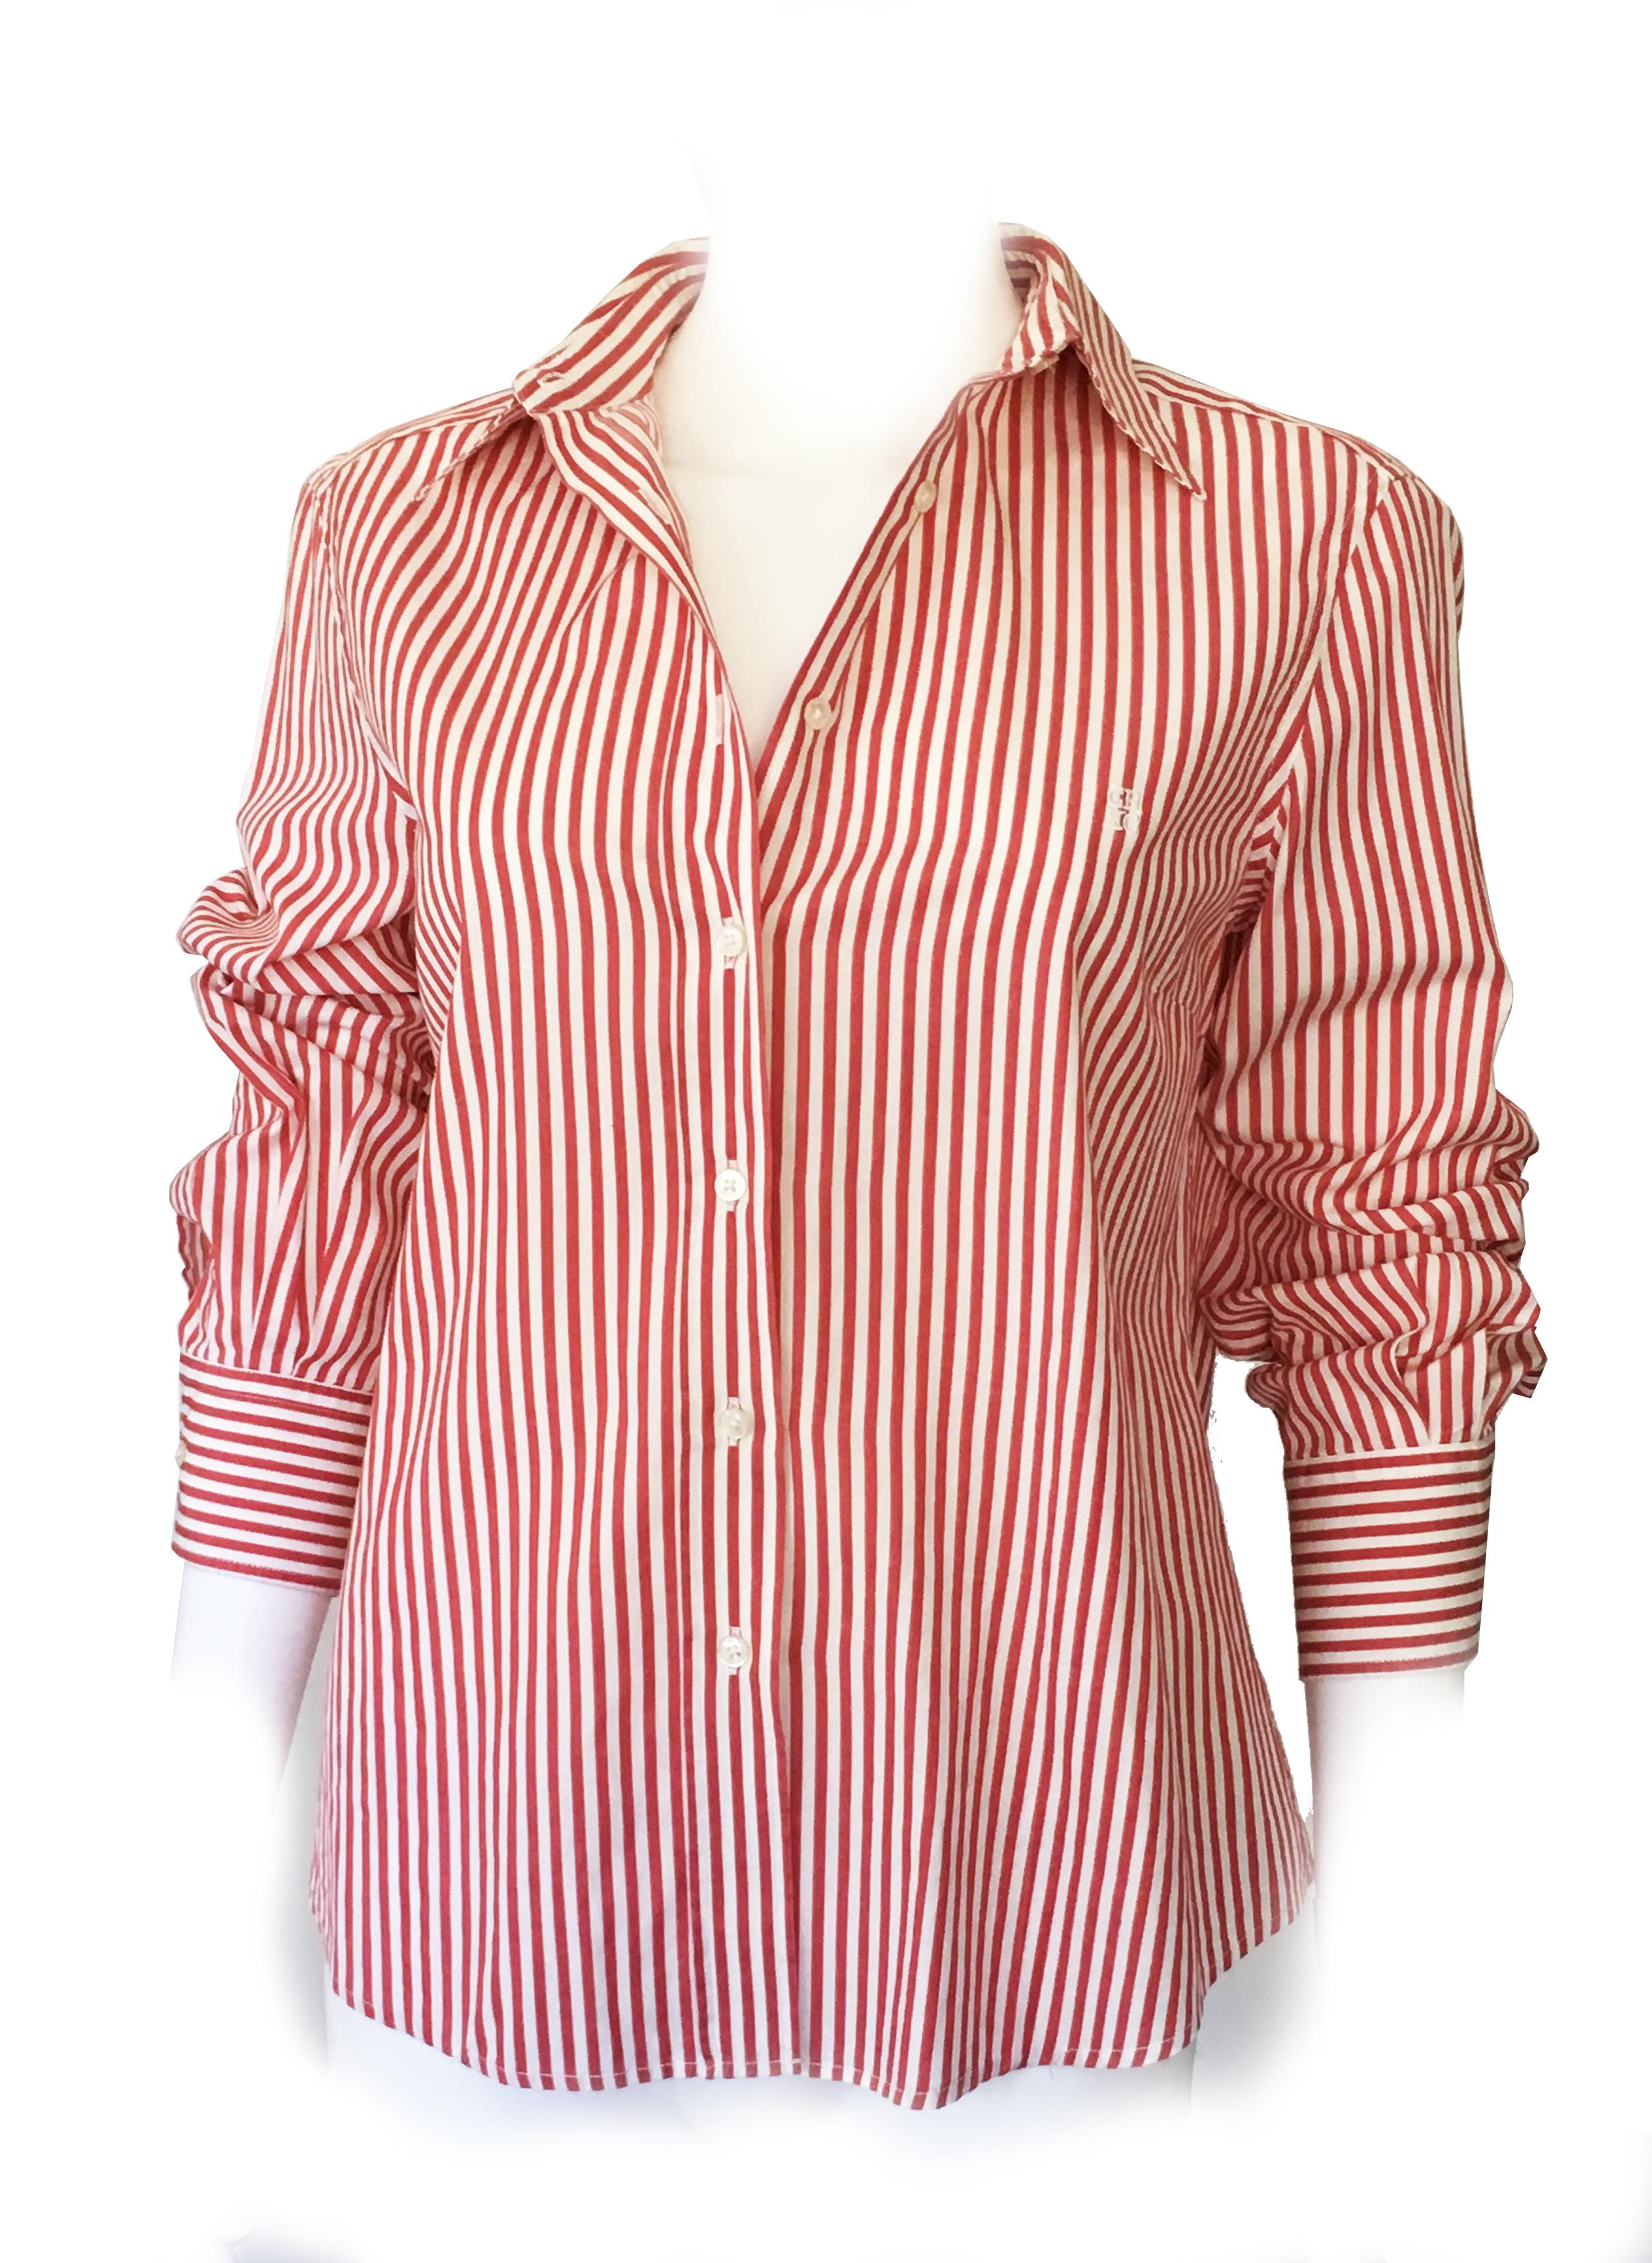 Carolina Herrera classic oxford red striped shirt